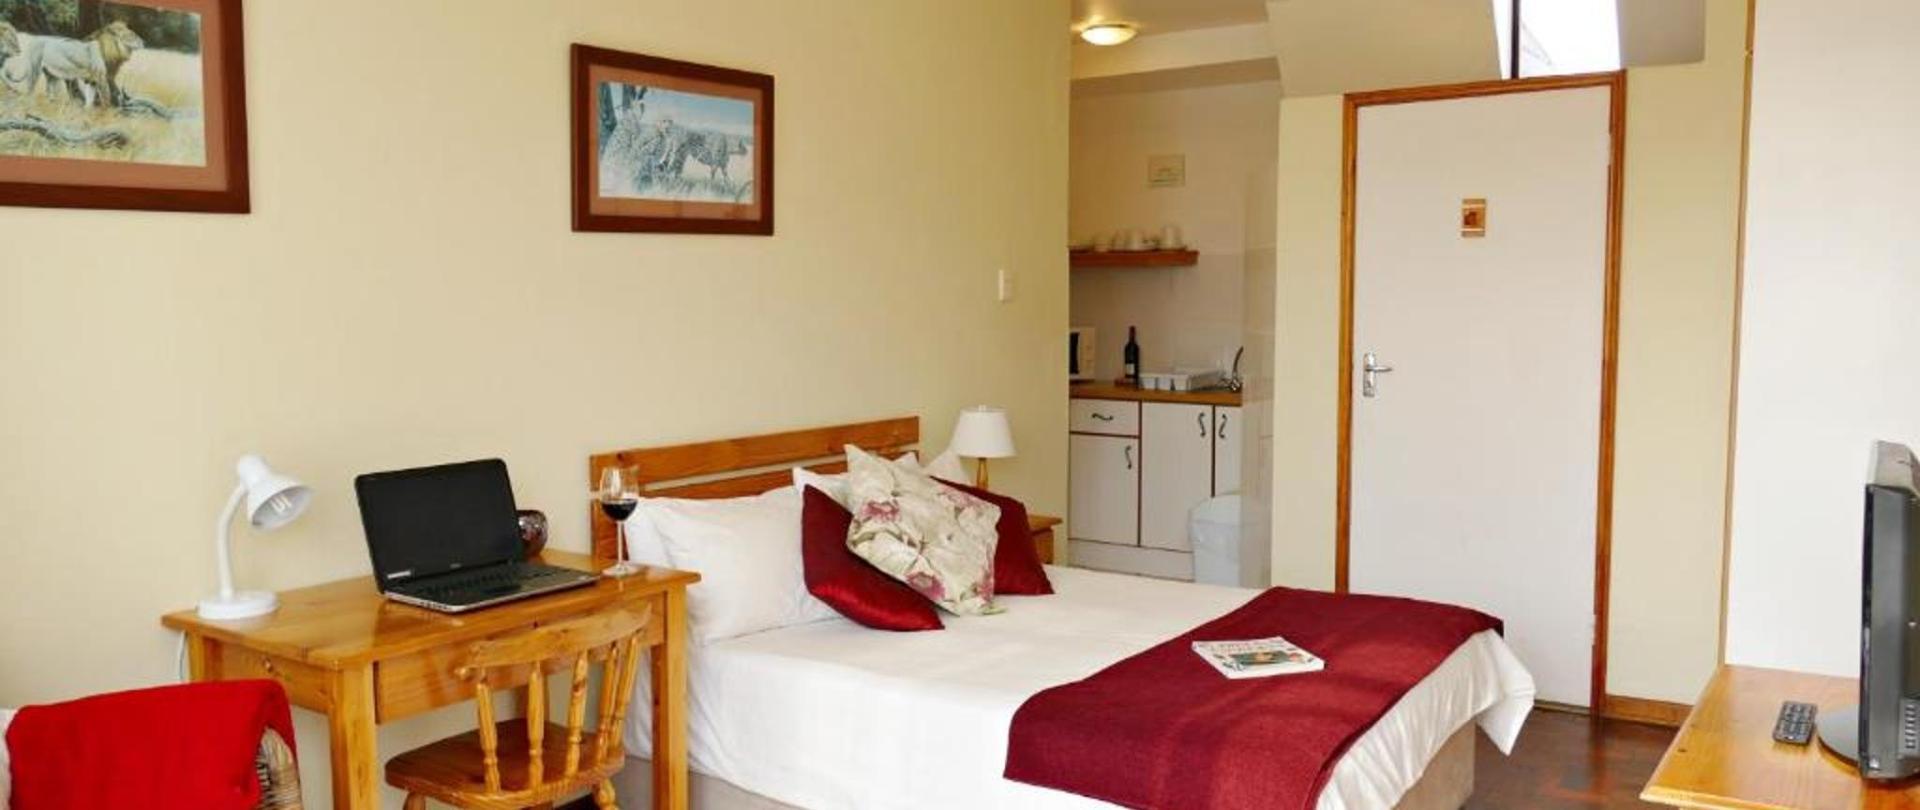 Budget bedroom.jpg